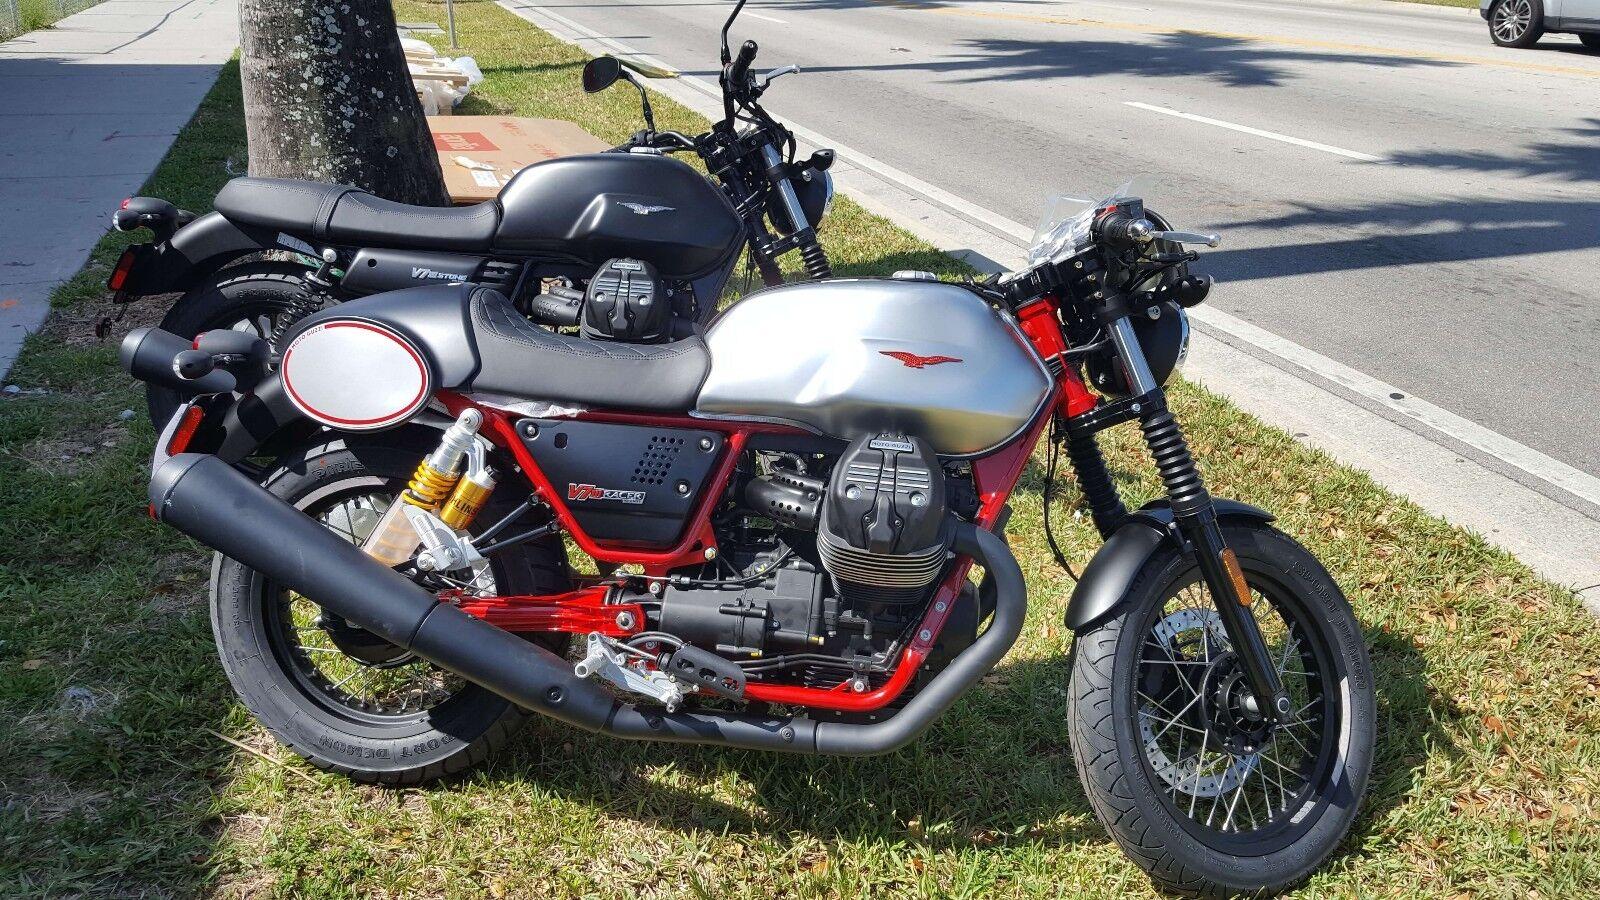 2017 Moto Guzzi V7 III Racer  2017 Moto Guzzi V7 III Racer